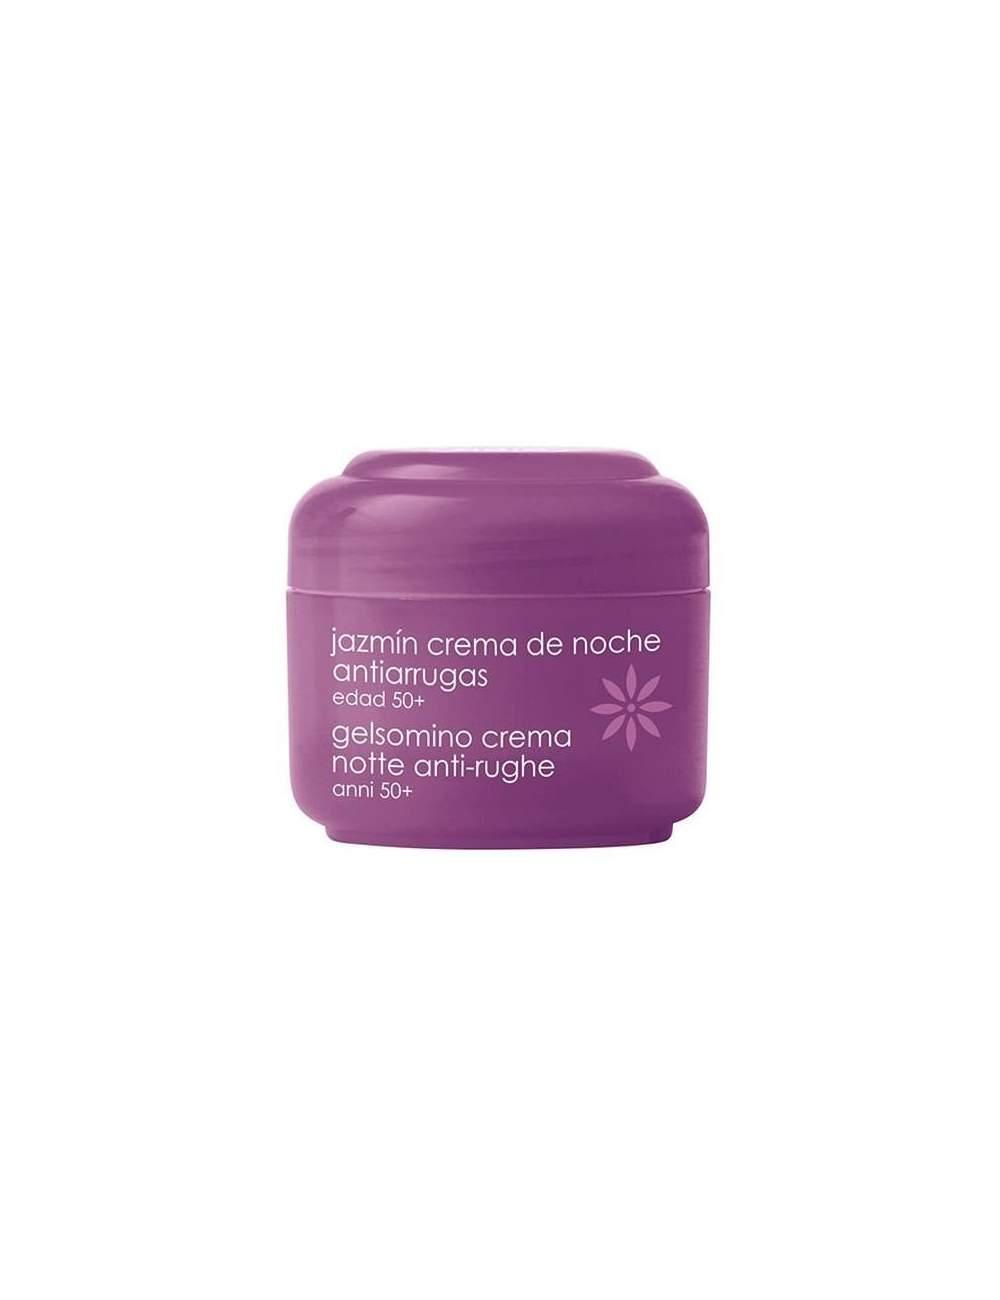 Crema Facial de Noche Natural Antiarrugas de Jazmín. Ziaja